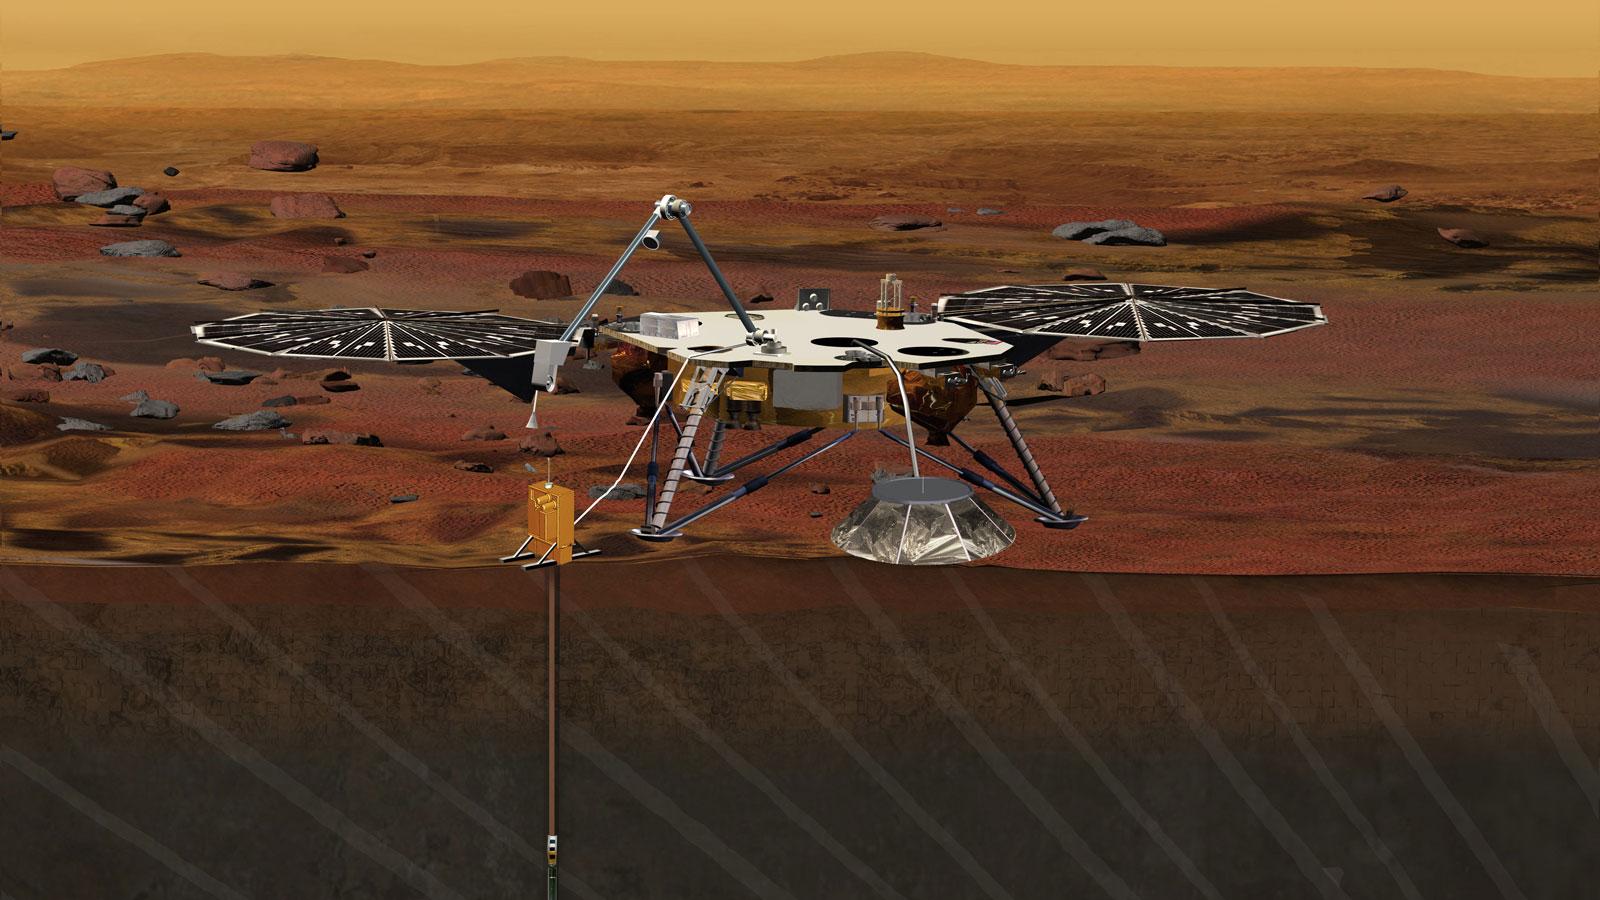 mars mission nasa - HD1600×900